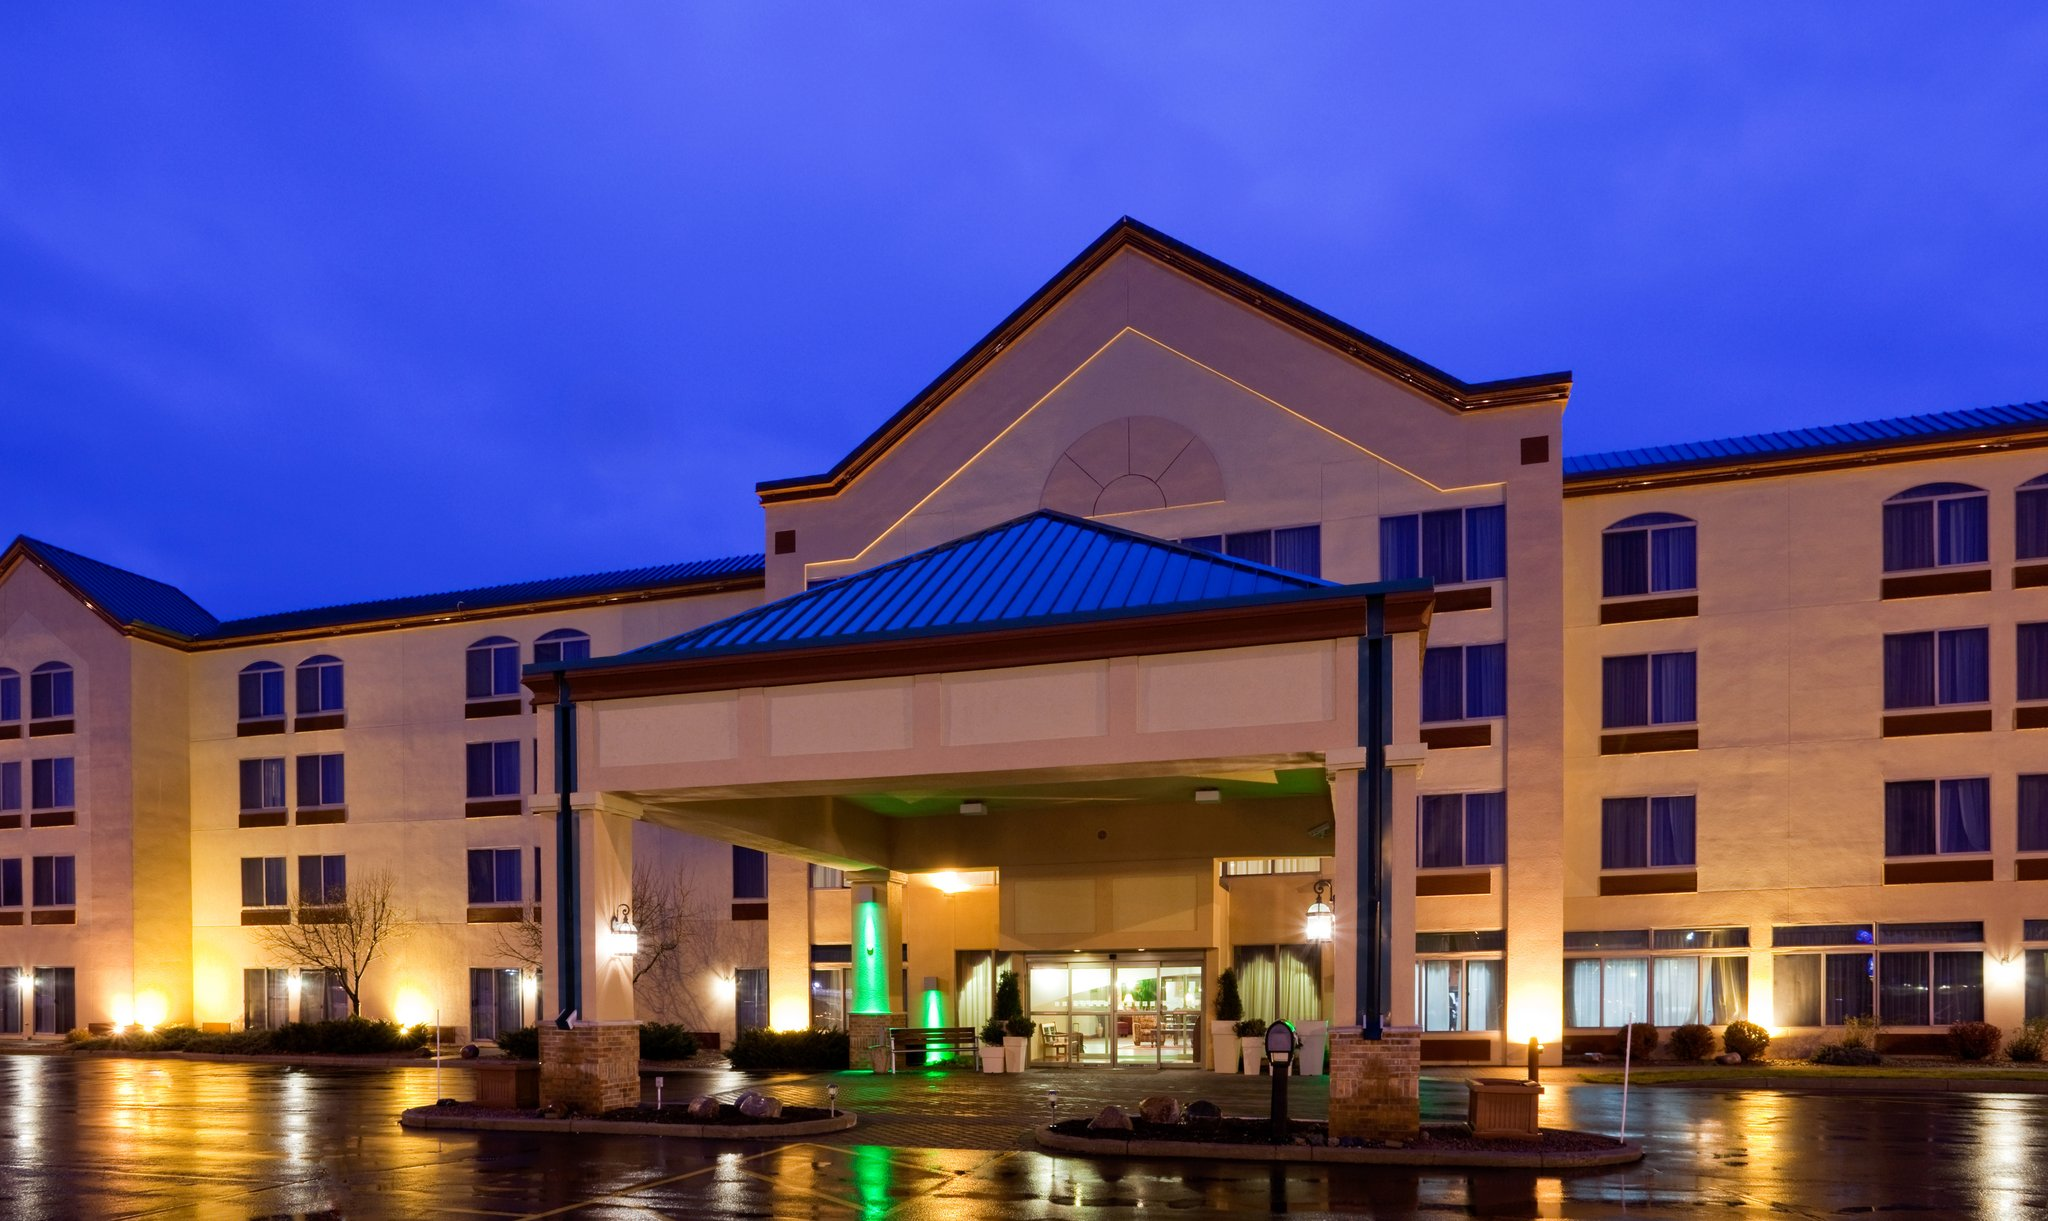 Holiday Inn & Suites WAUSAU-ROTHSCHILD